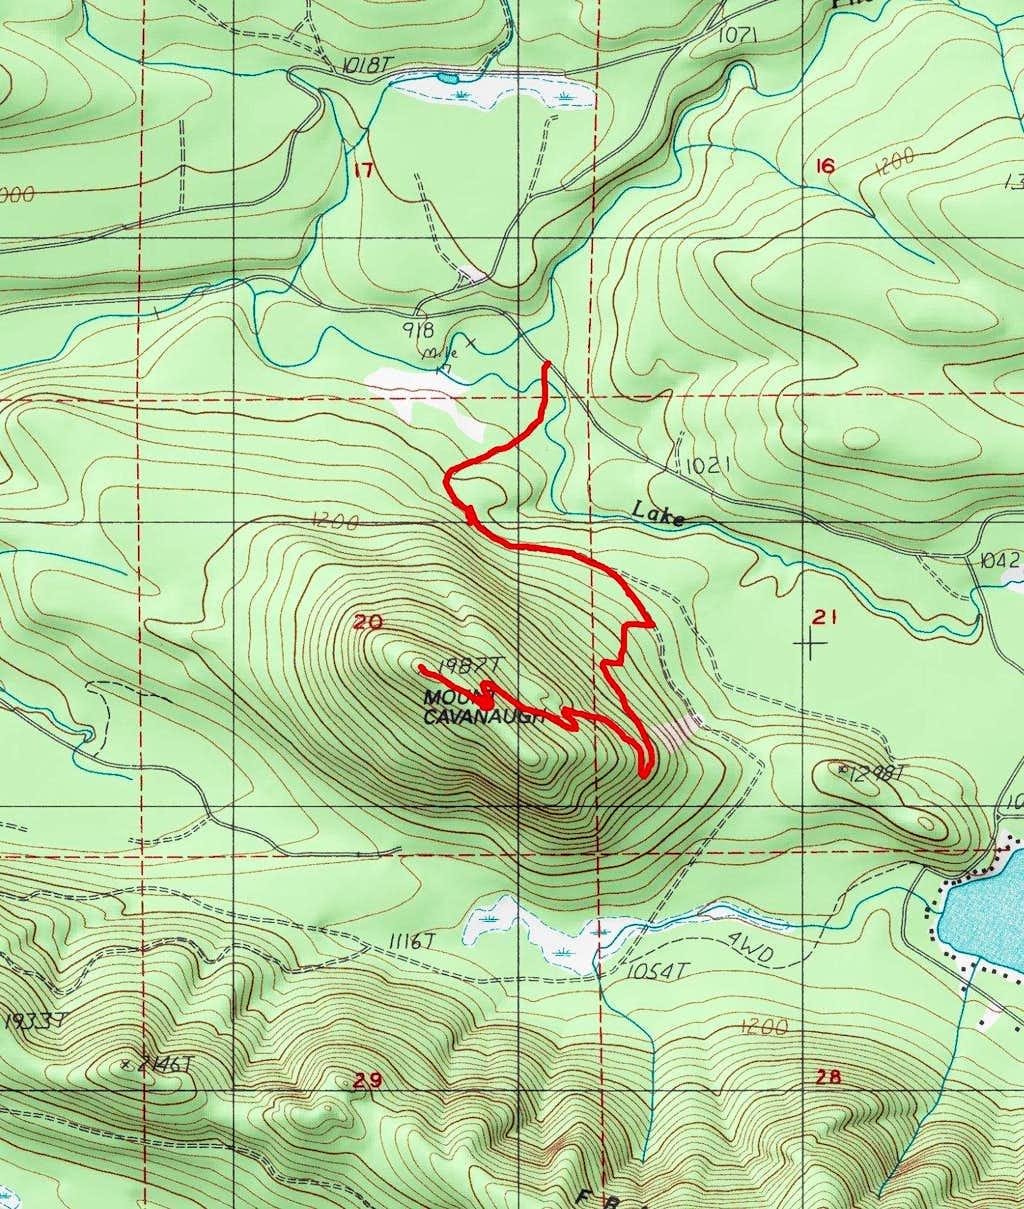 Route Up Mount Cavanaugh